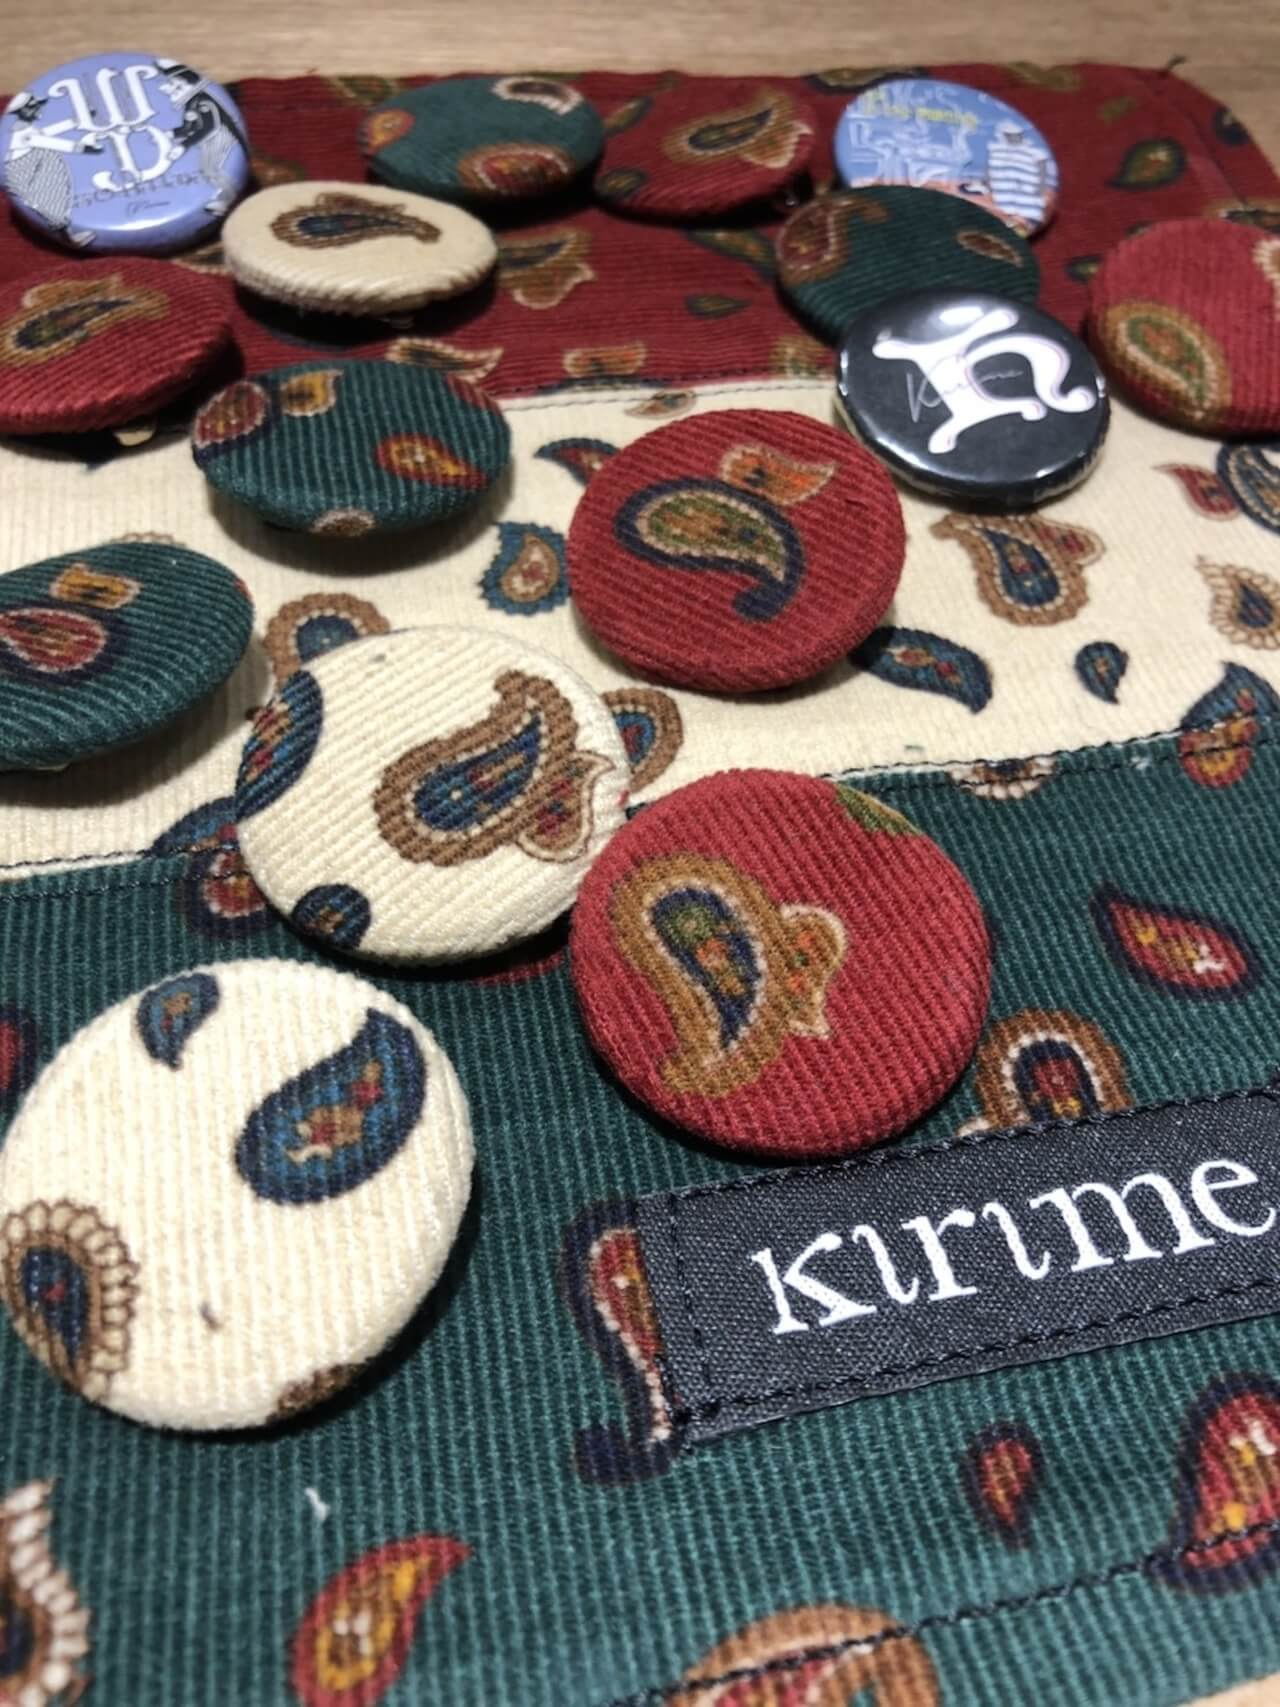 MEN YARD FIGHTなどでポップアップを行う「KIRIME」、次の展示は東急プラザ銀座にて life-fashion210424-kirime-1